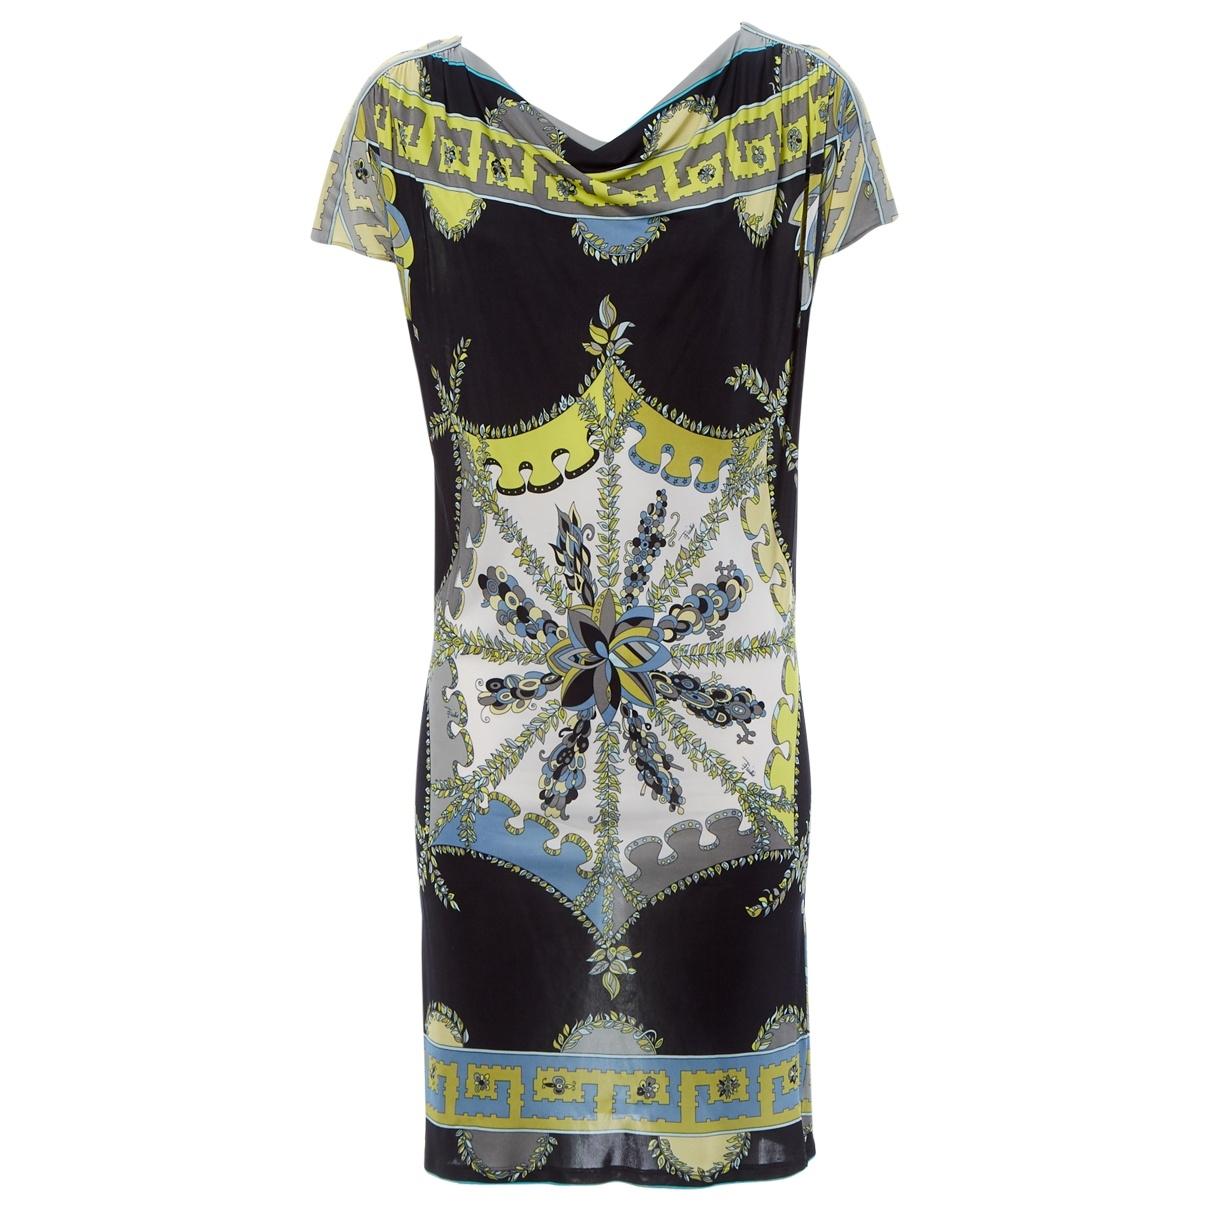 Emilio Pucci \N Black dress for Women 40 IT